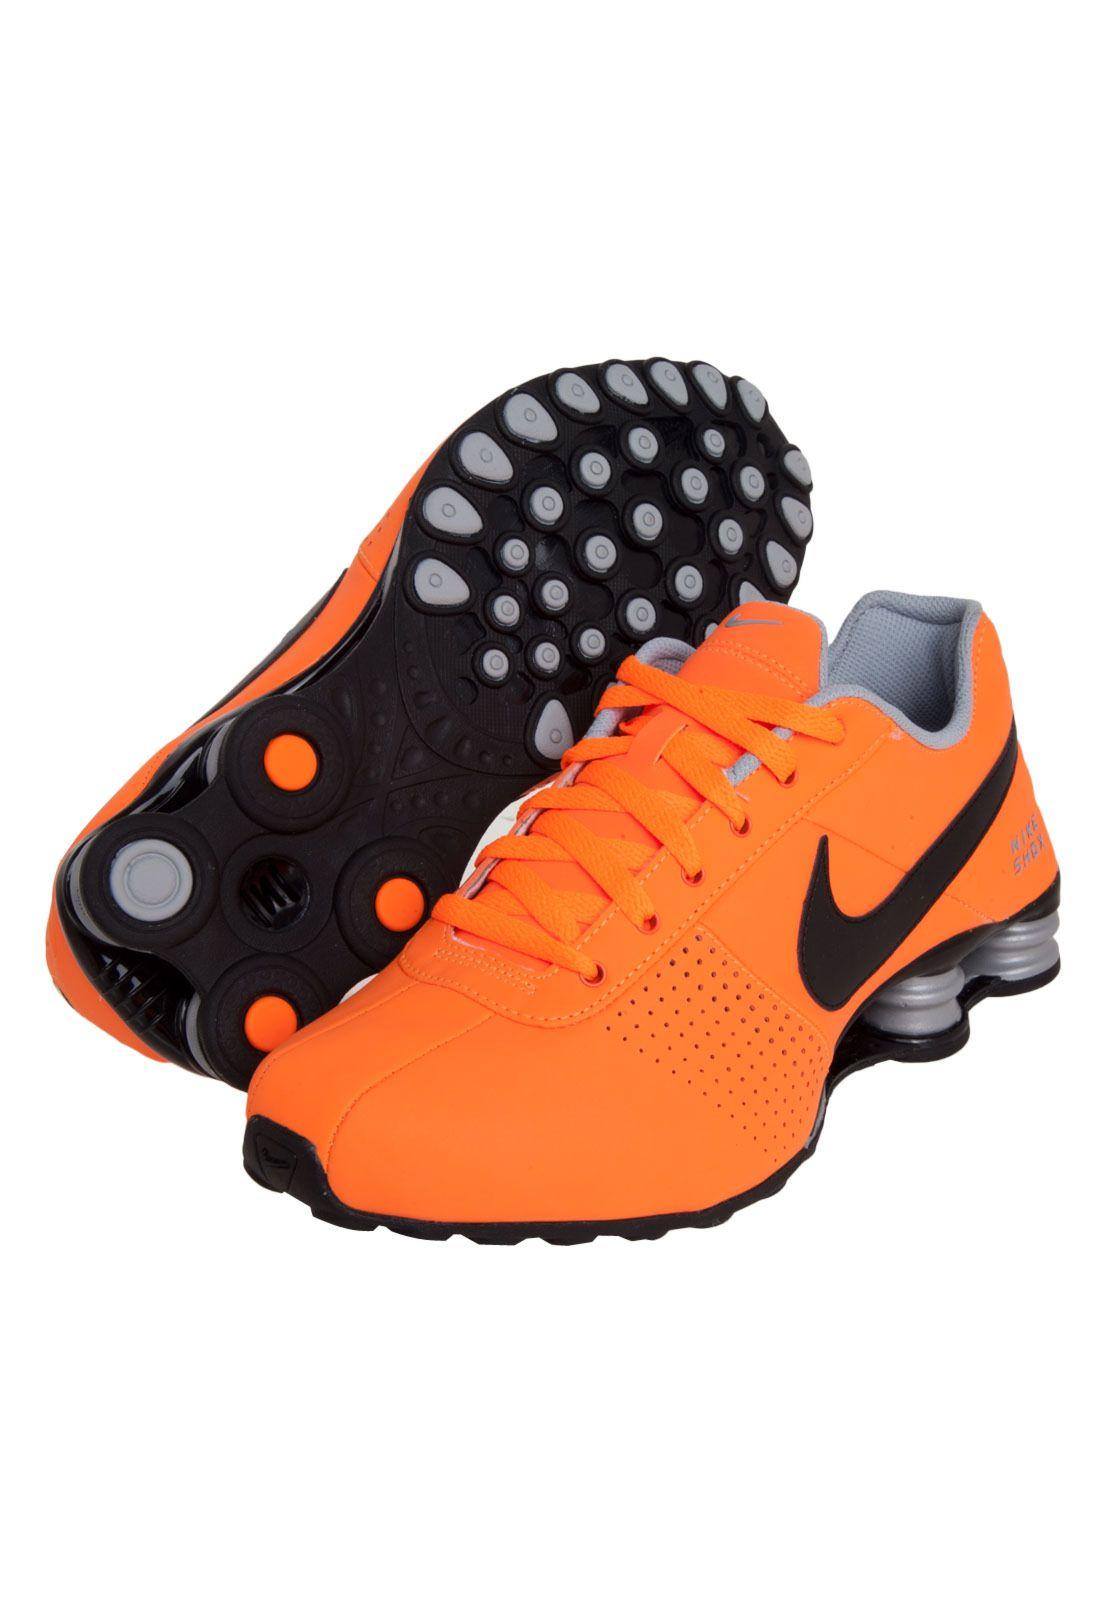 Nike Tennis Shoes, Nike Sneakers, Sports Shoes, Running Outfits, Nike  Running, Running Shoes, Black Nikes, Black Nike Shox, Orange Shoes